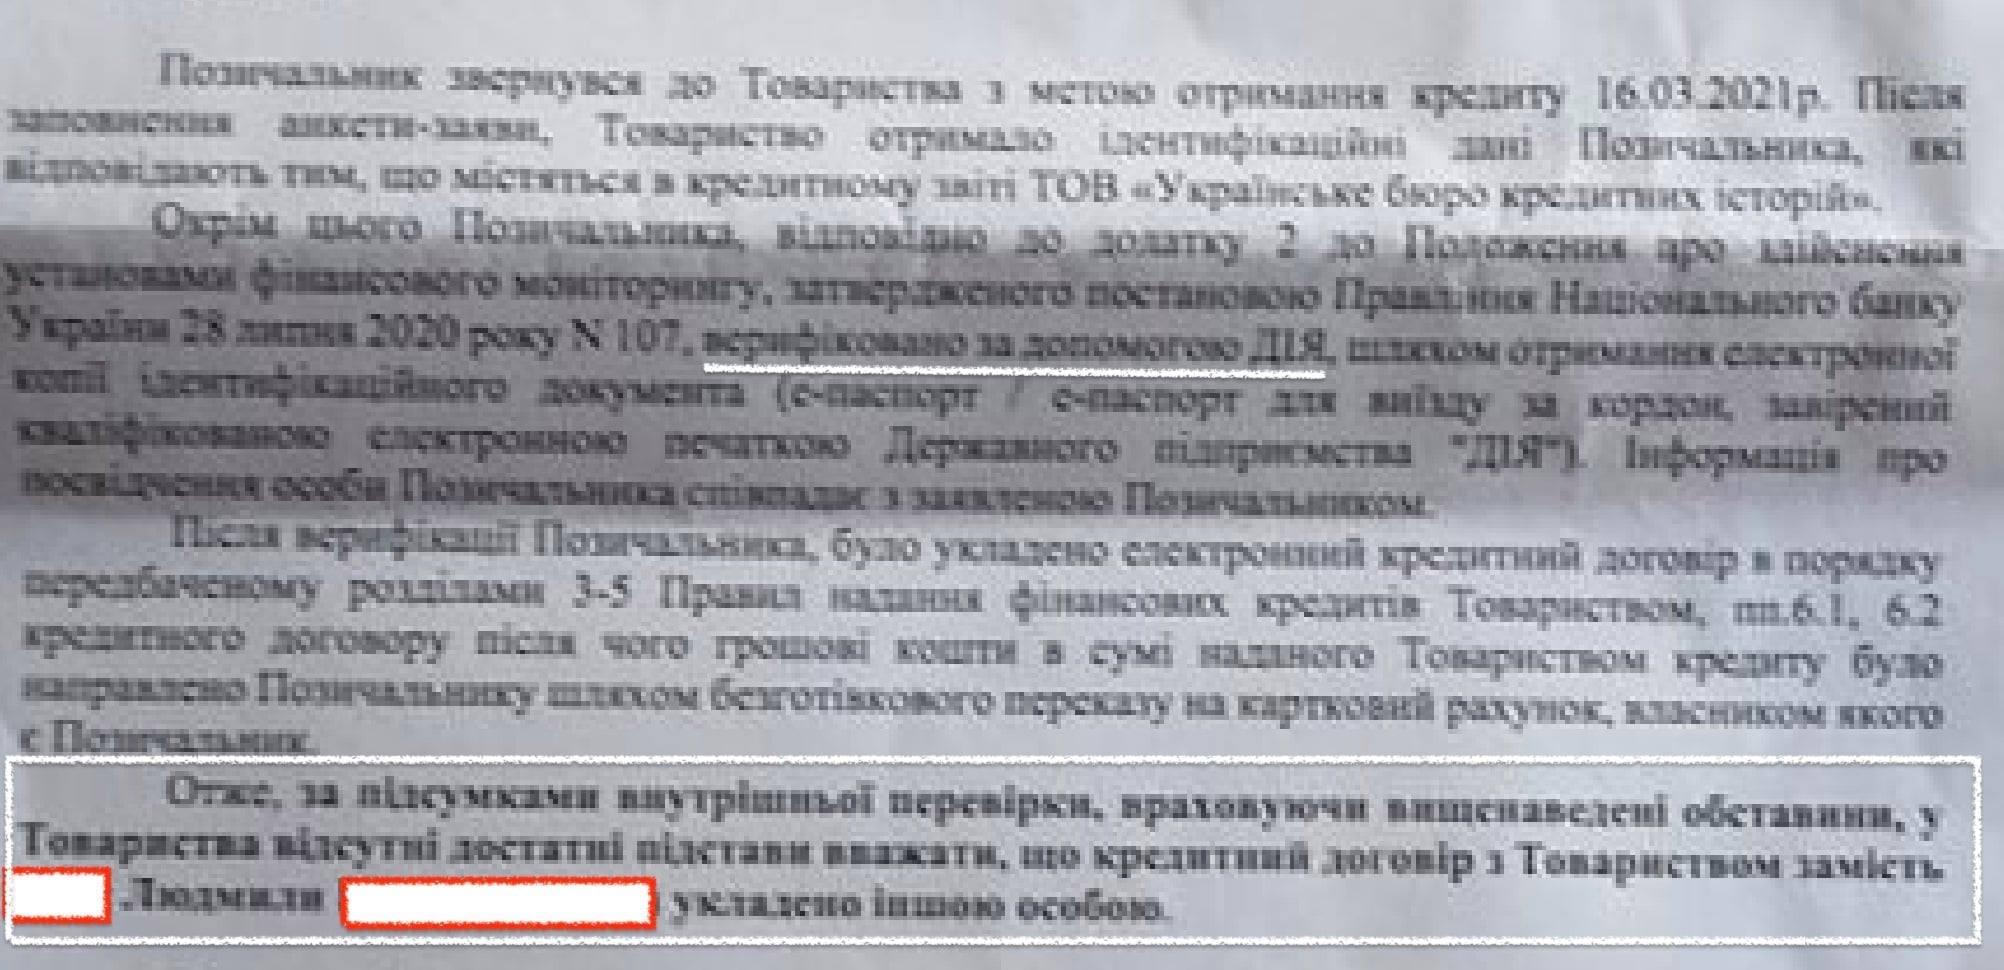 Сообщение из банка, скриншот из Facebook Константина Корсуна